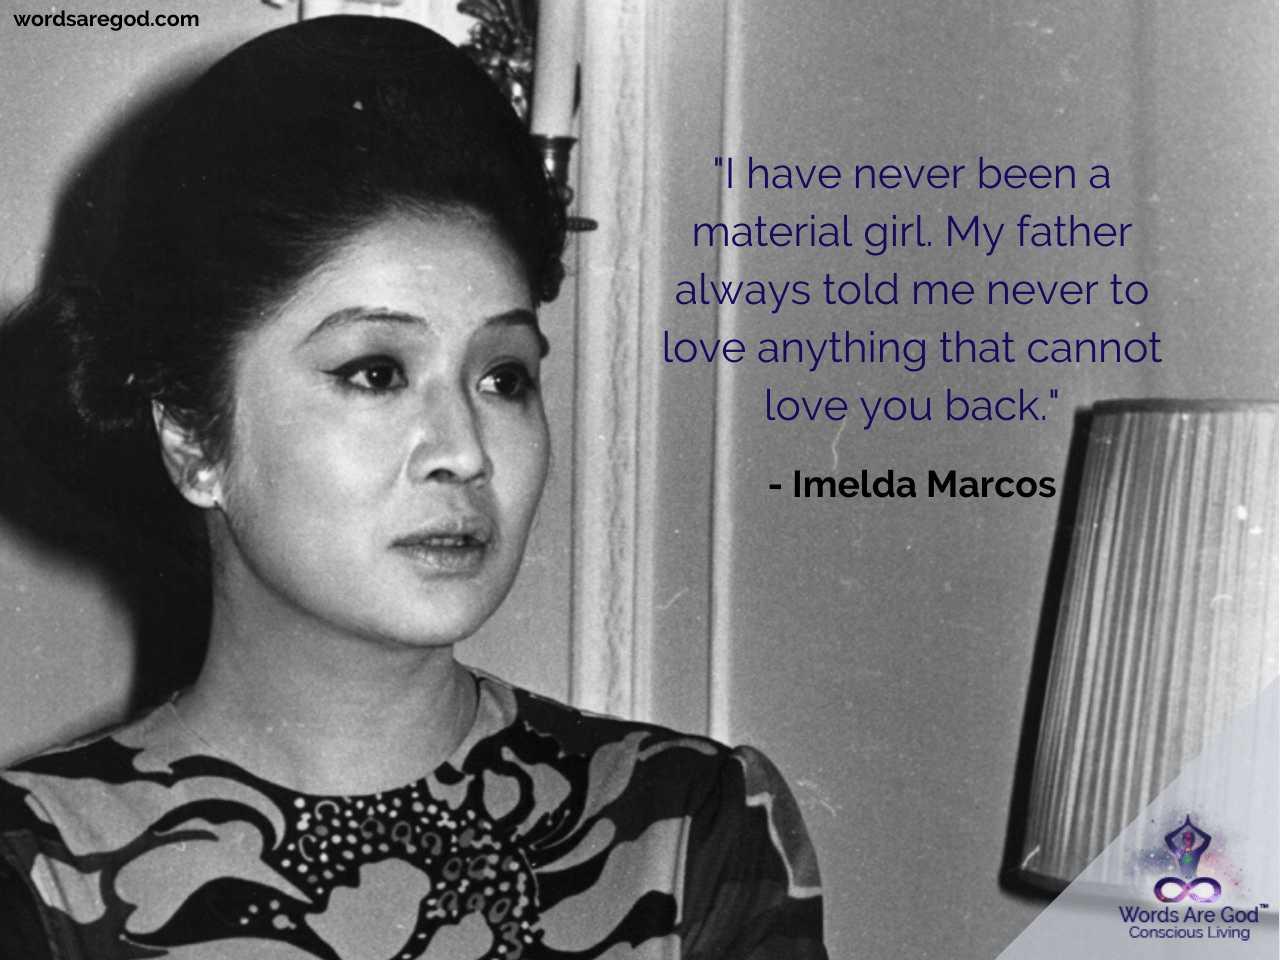 Imelda Marcos Motivational Quote by Imelda Marcos